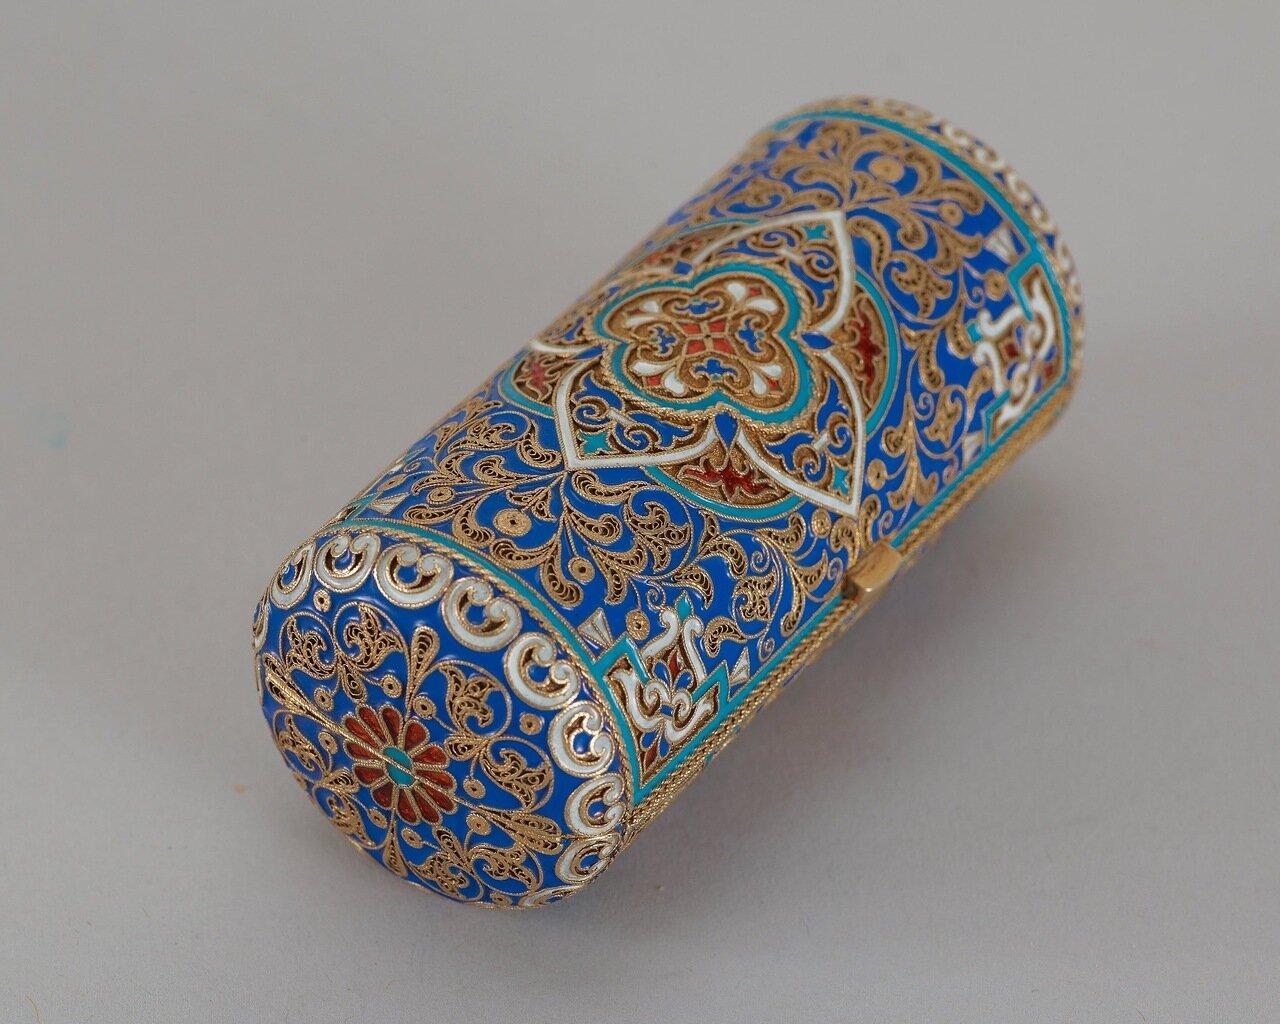 Русское антикварное серебро 0_11bc07_be782471_XXXL